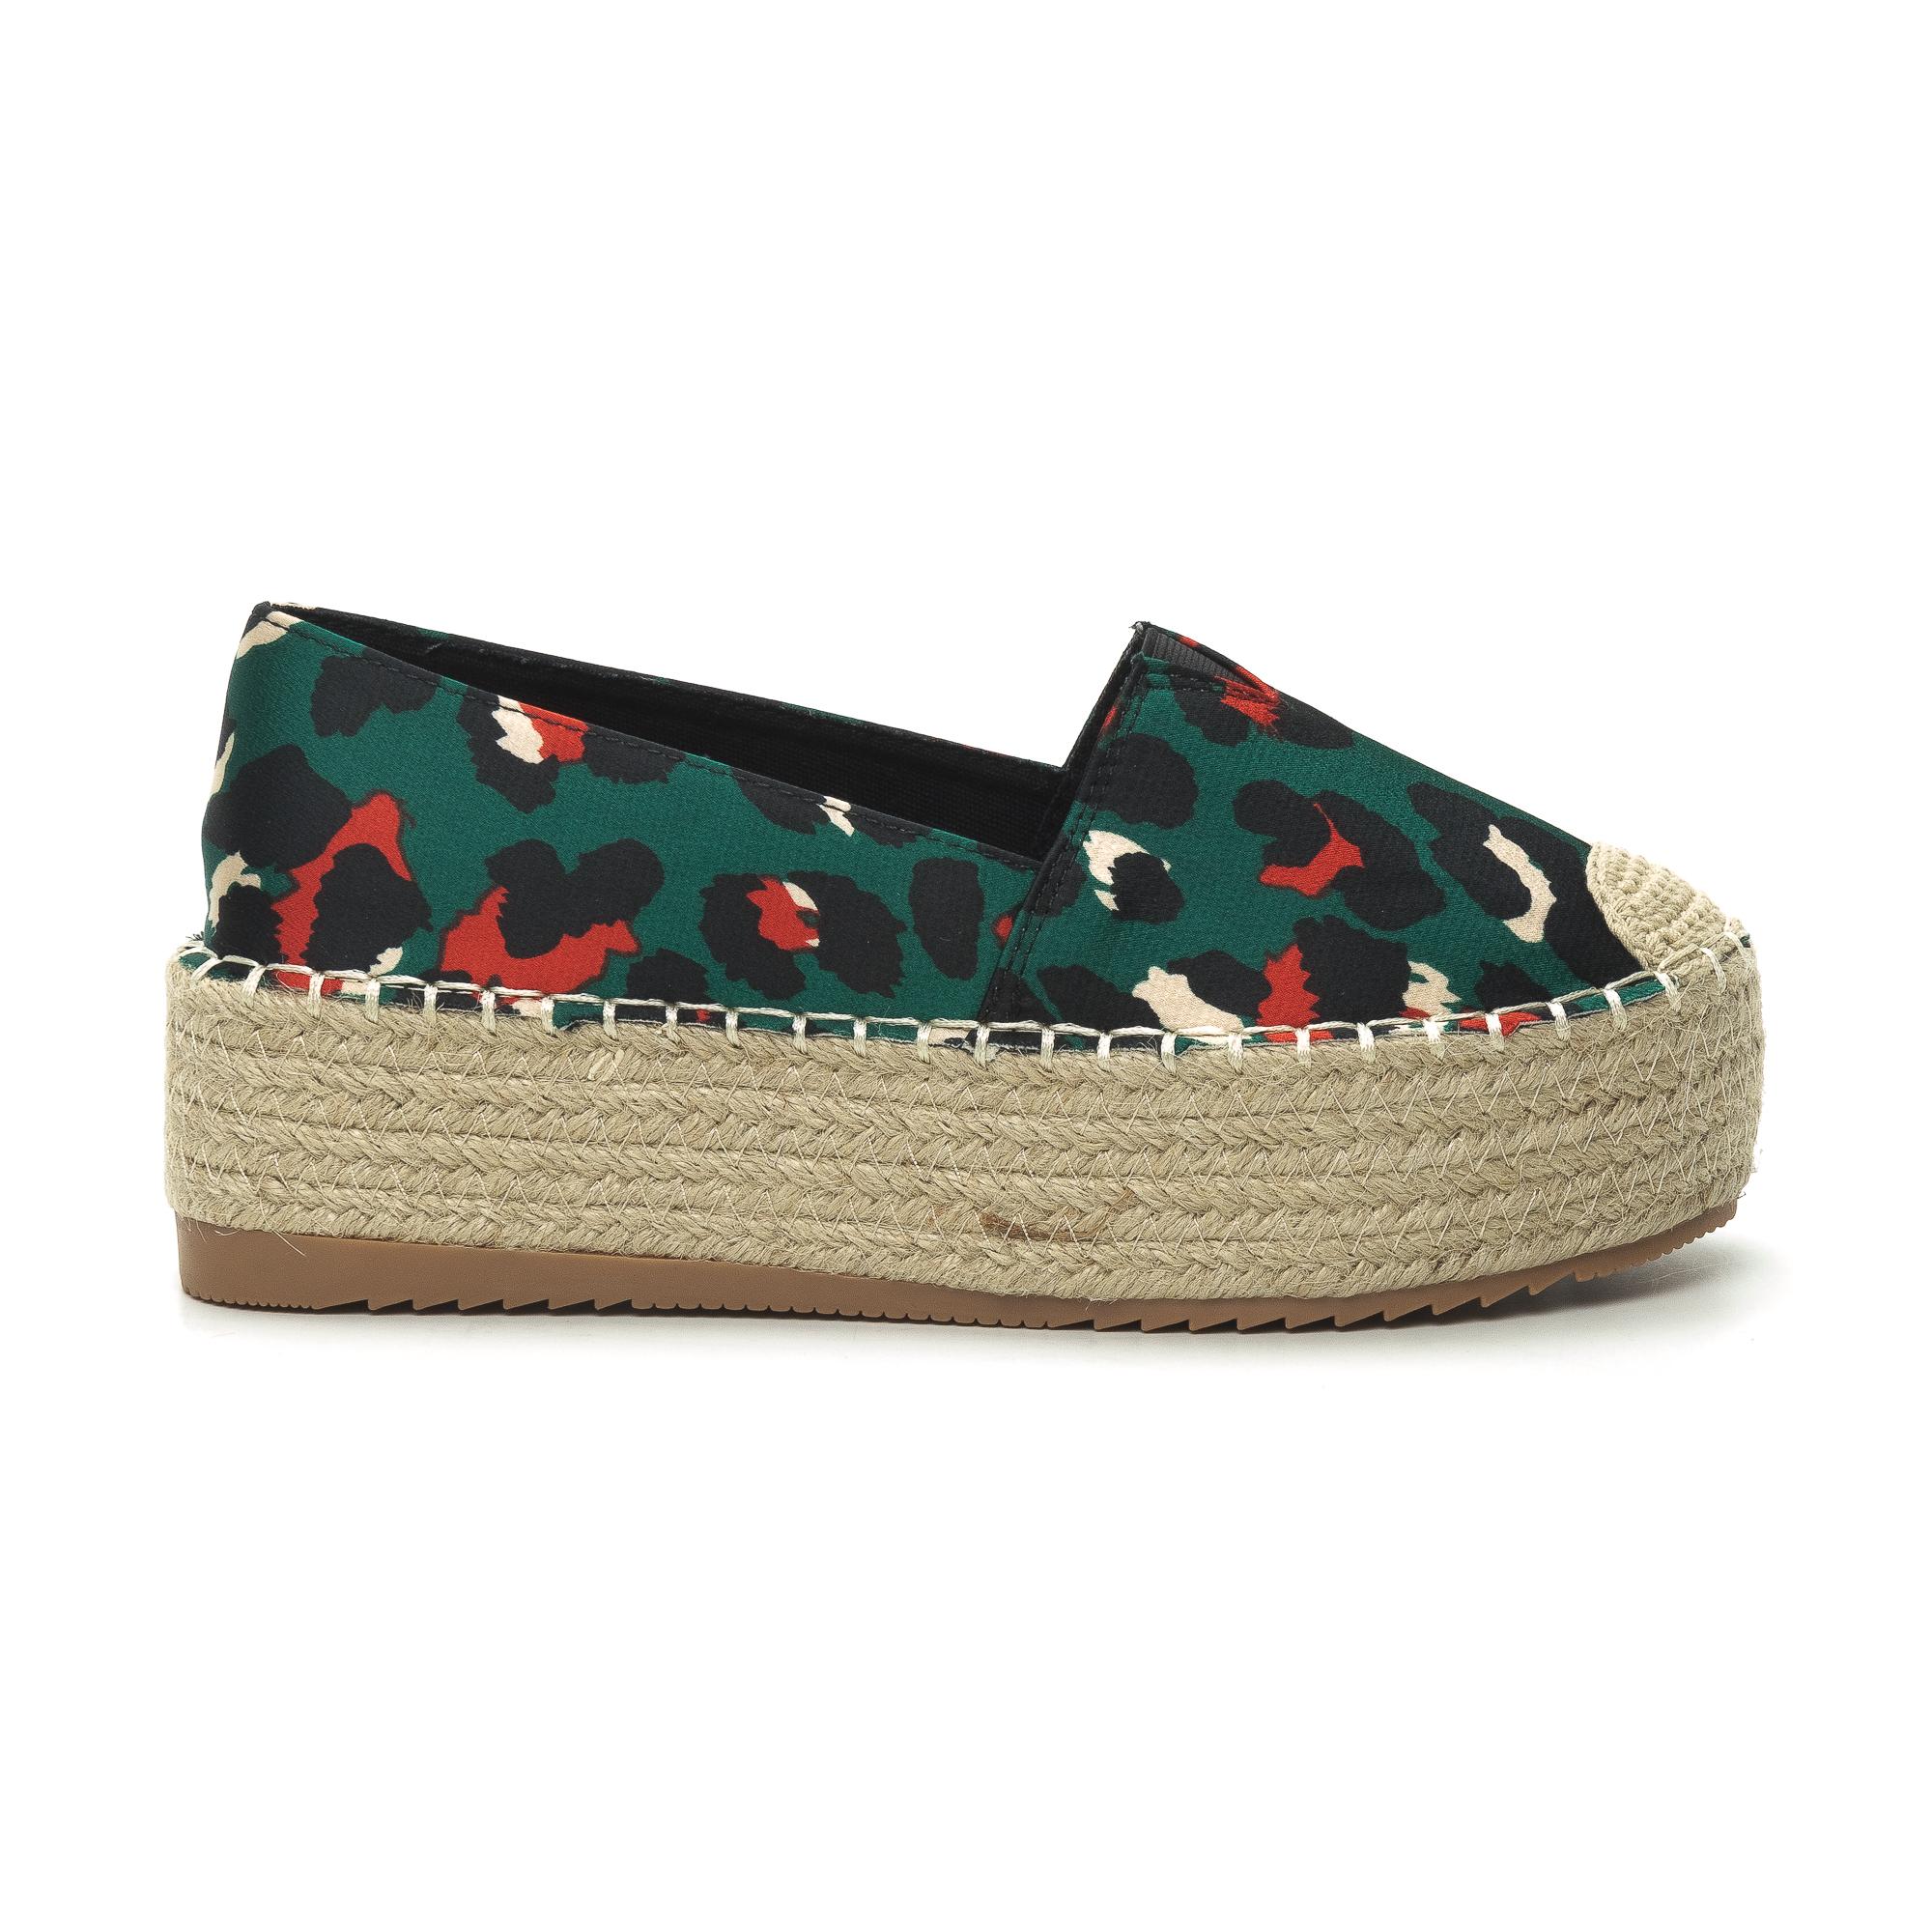 293c951dd21 Ανδρικά μαύρα αθλητικά παπούτσια Kiss με αερόσολα. 26.99 €Περισσότερα » ·  Fashionmix Γυναικείες πράσινες eσπαντρίγιες Bounarotti